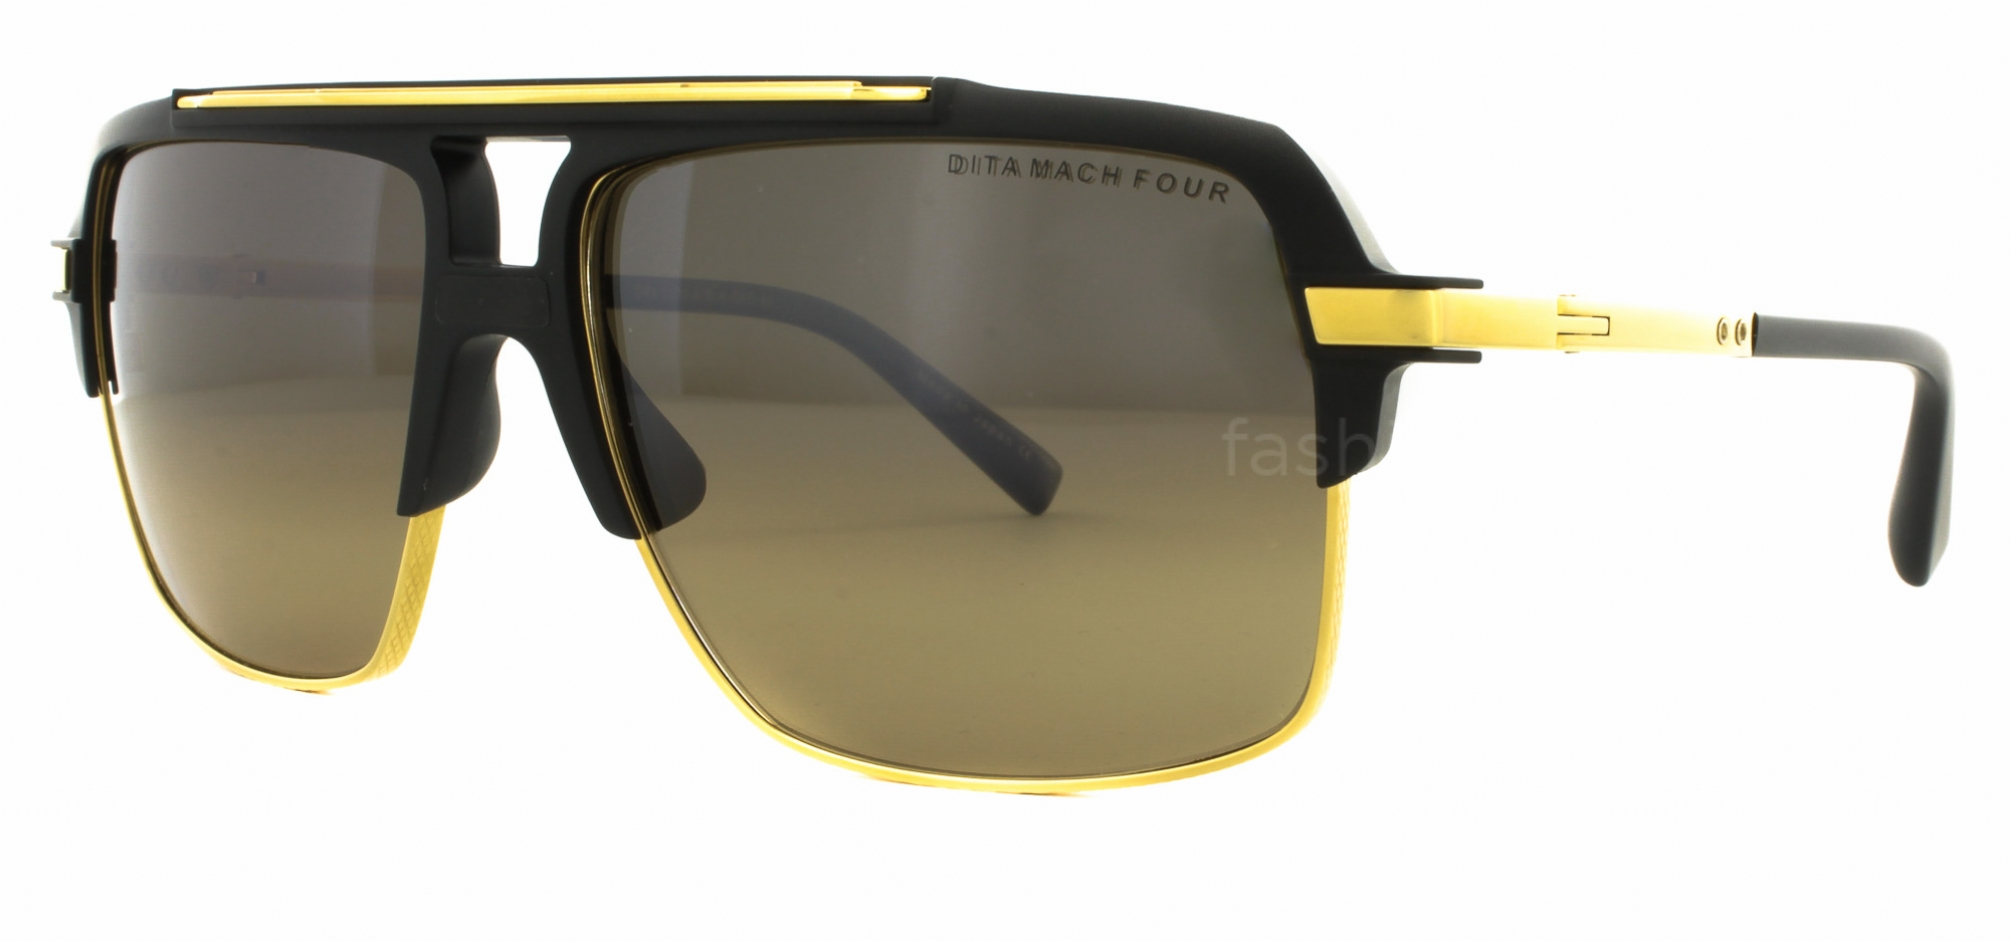 94a775796dfb Buy Dita Sunglasses directly from OpticsFast.com